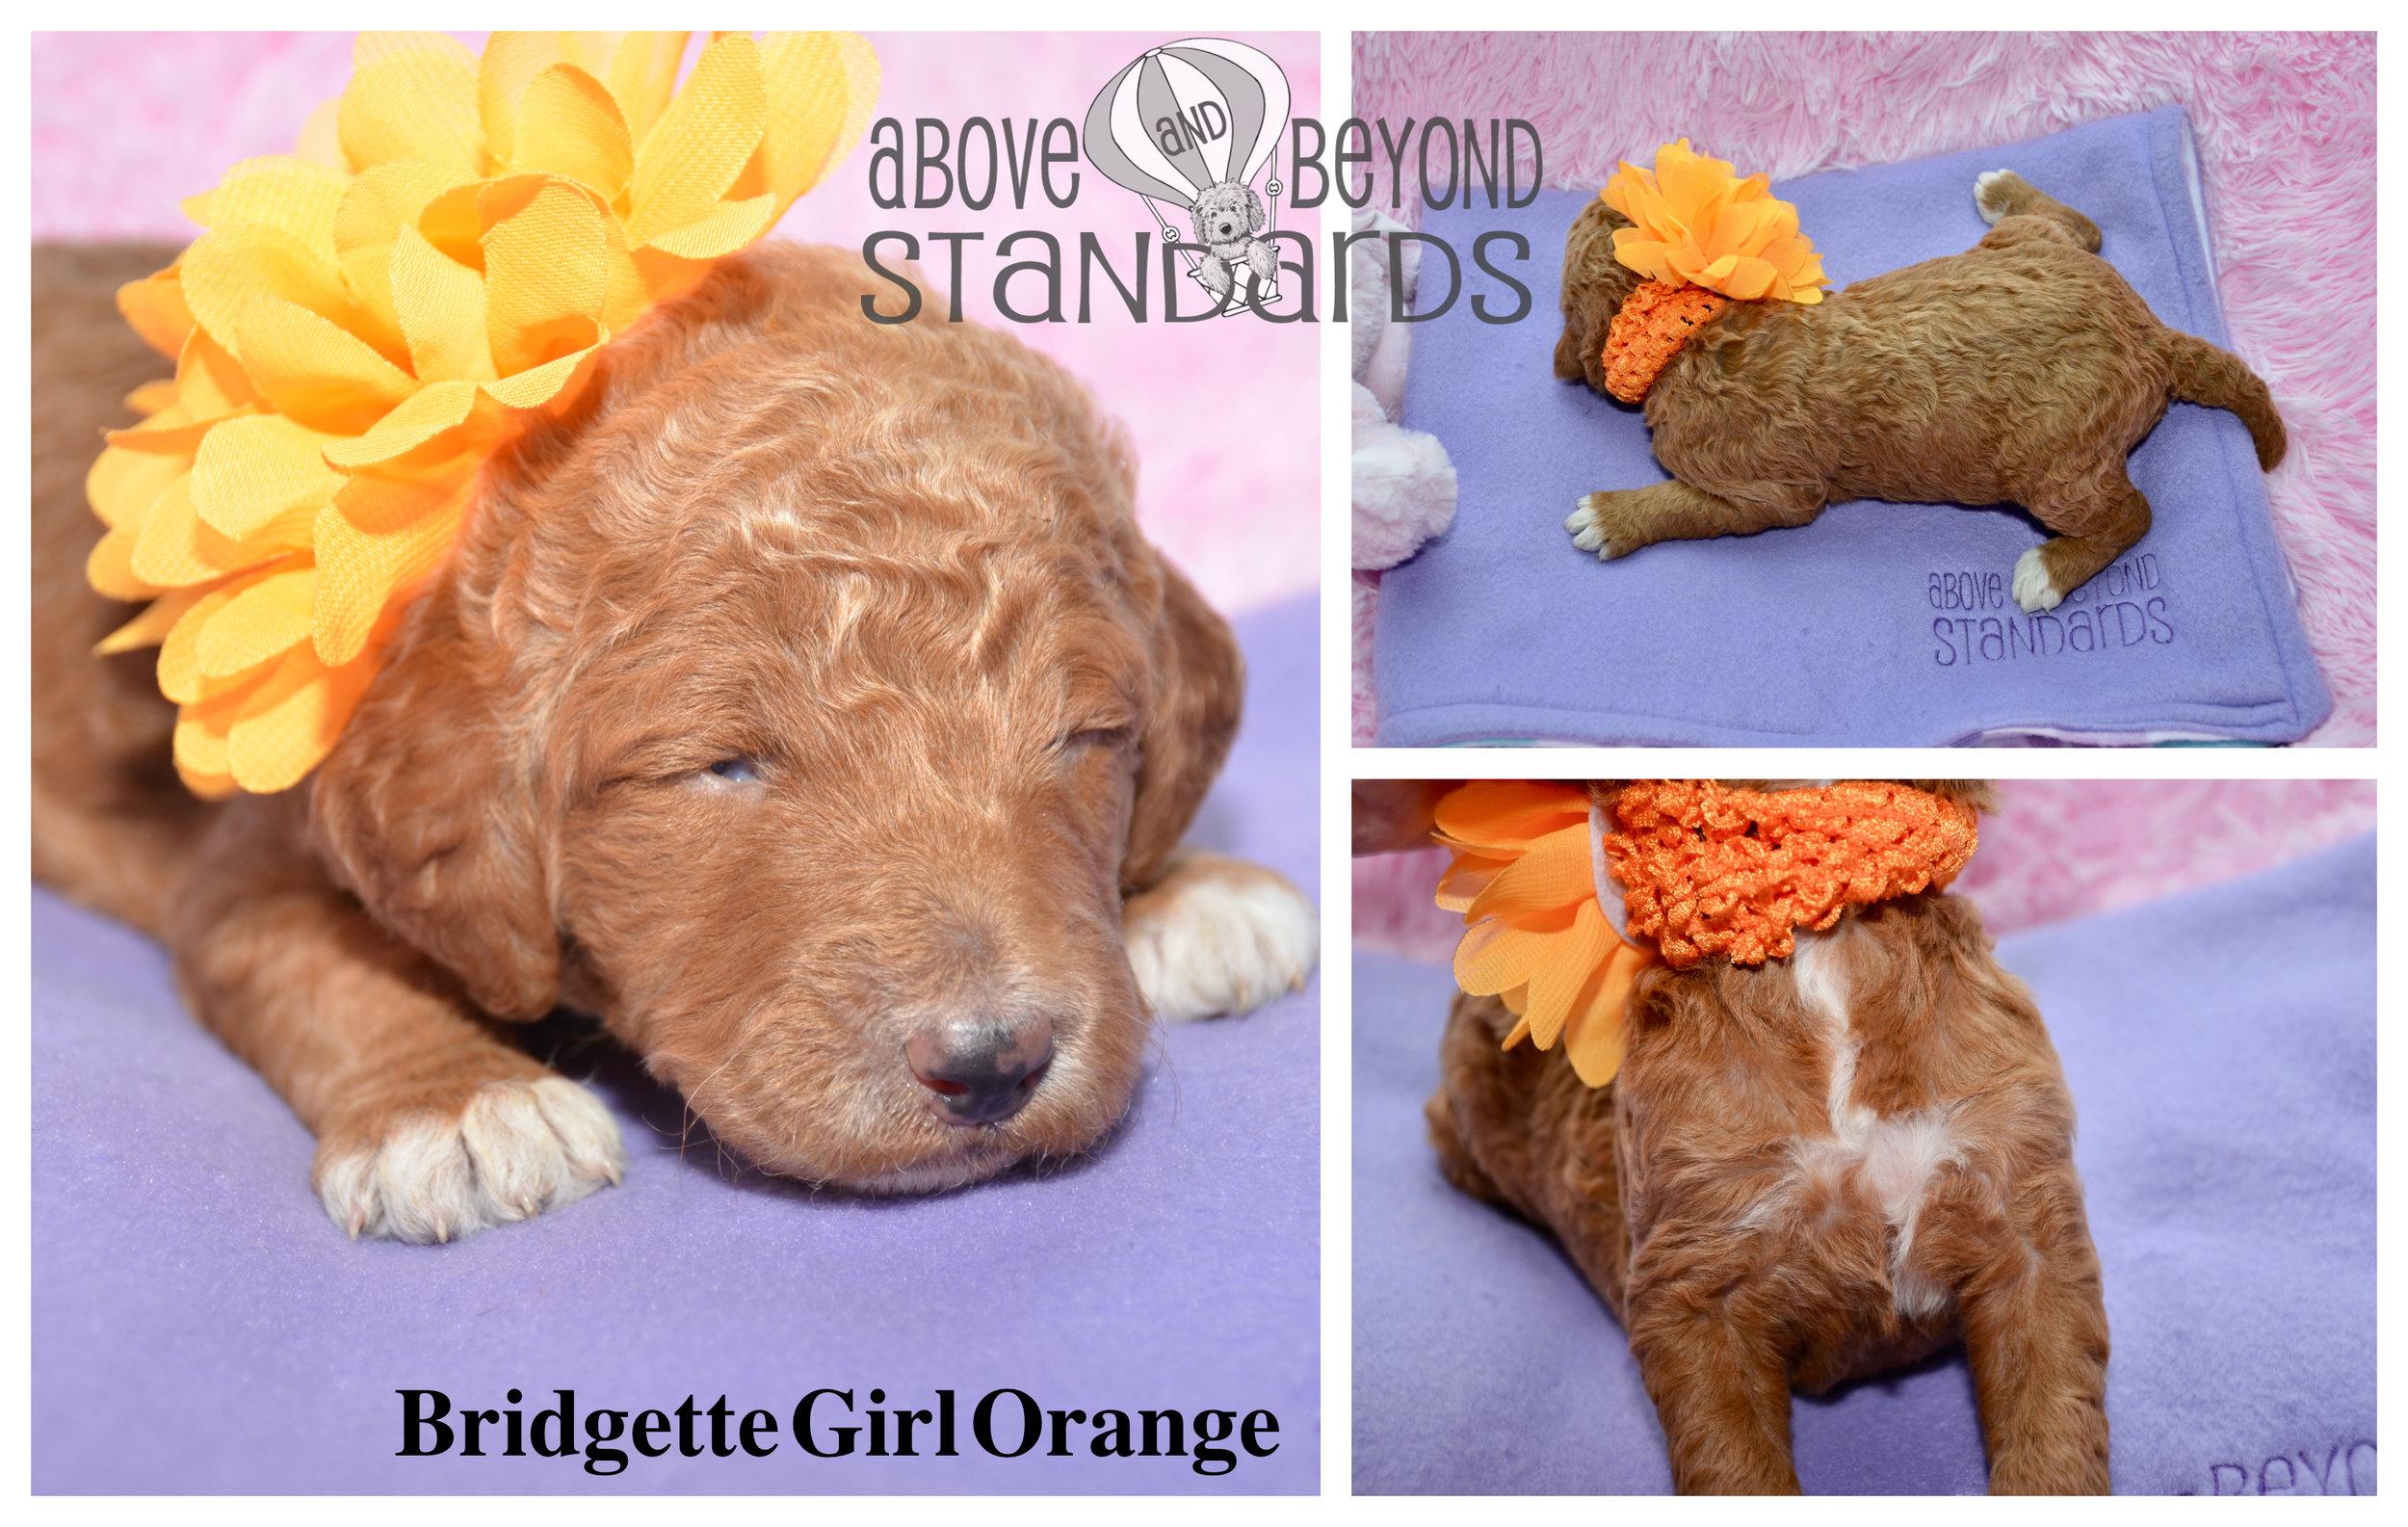 Bridgette Girl Orange - EMILIE & CRUSHER STANDARD POODLE FEBRUARY 2ND, 2019.jpg